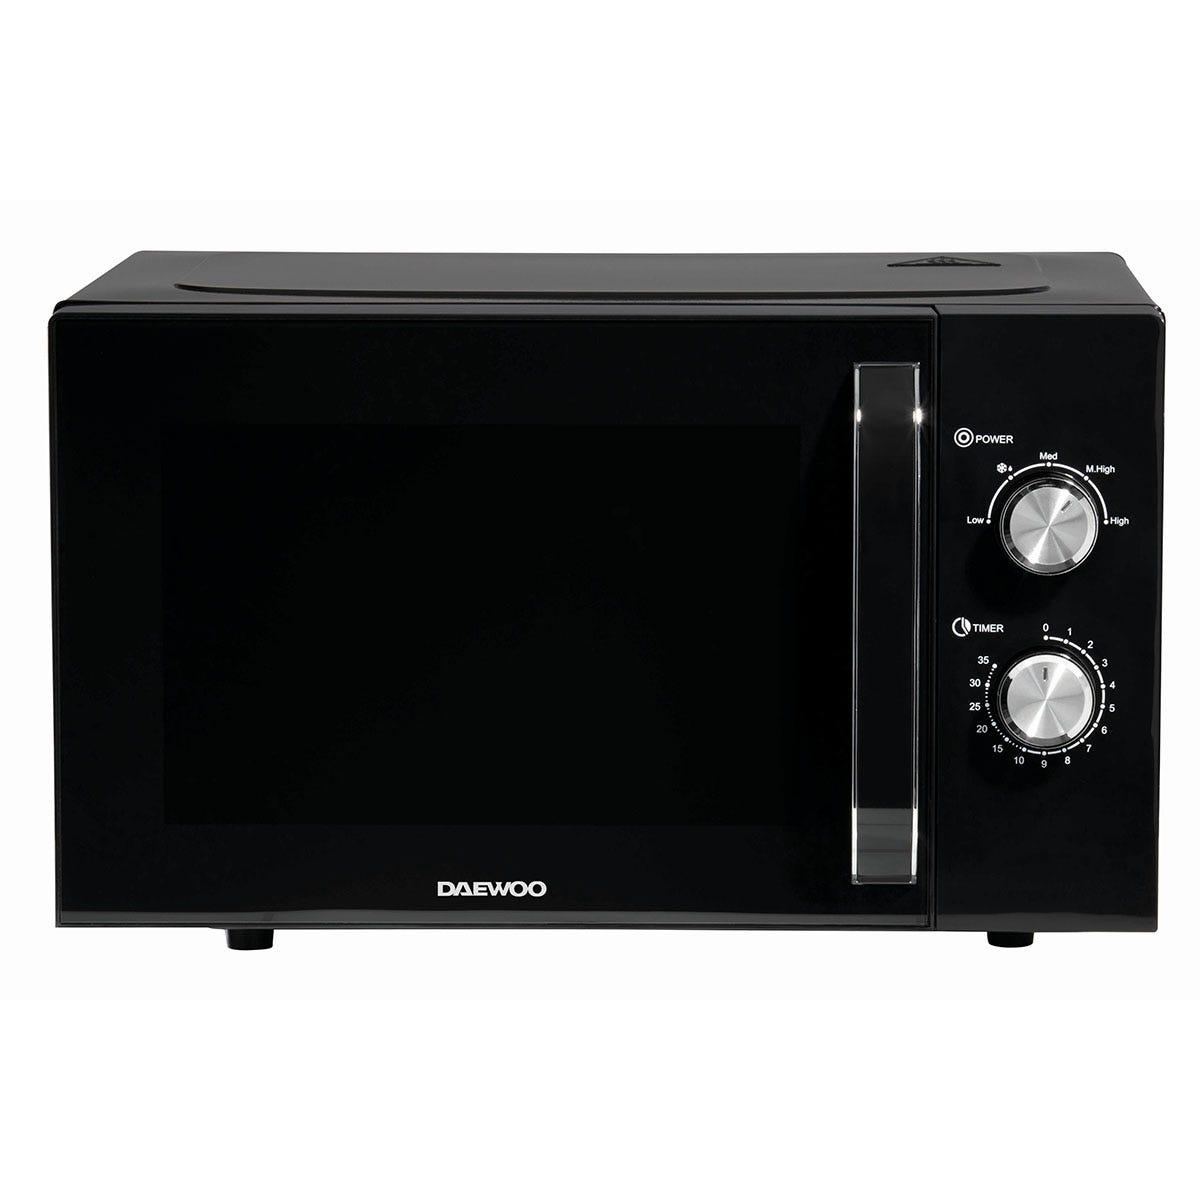 Daewoo SDA2085GE 23L 800W Manual Microwave - Black